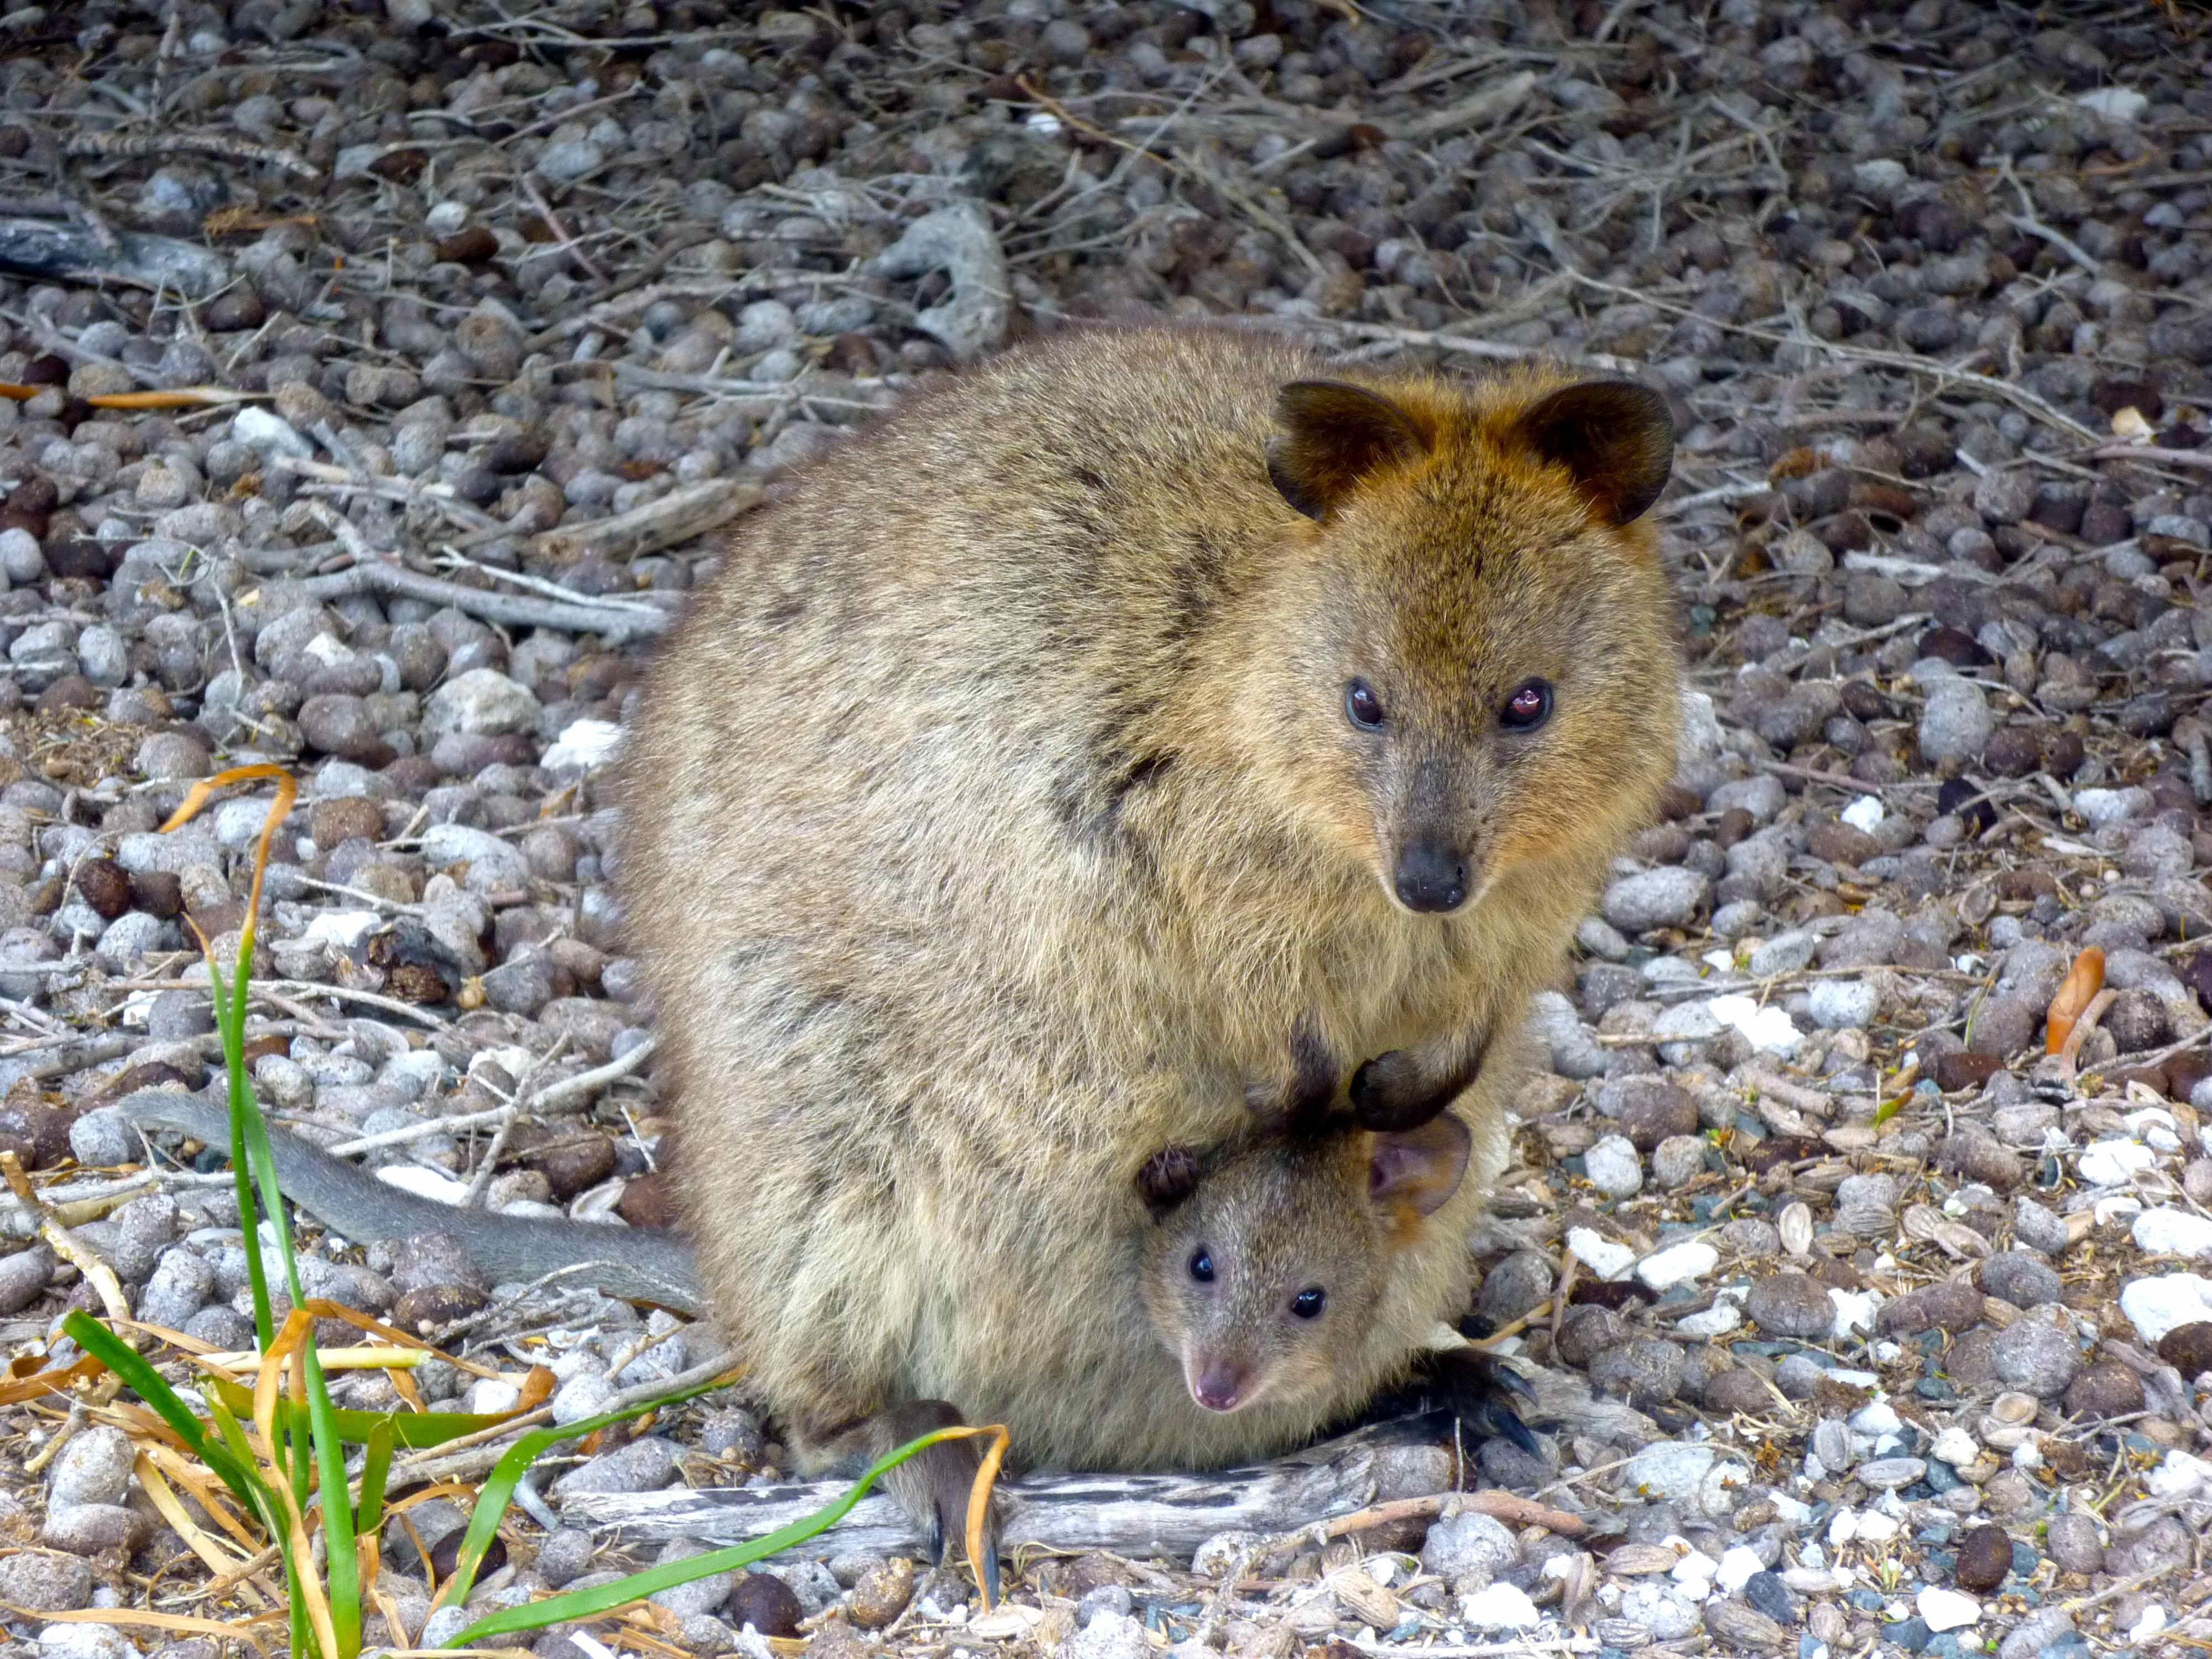 Mama quokka and her tiny baby. | Interesting & Odd Animals ...